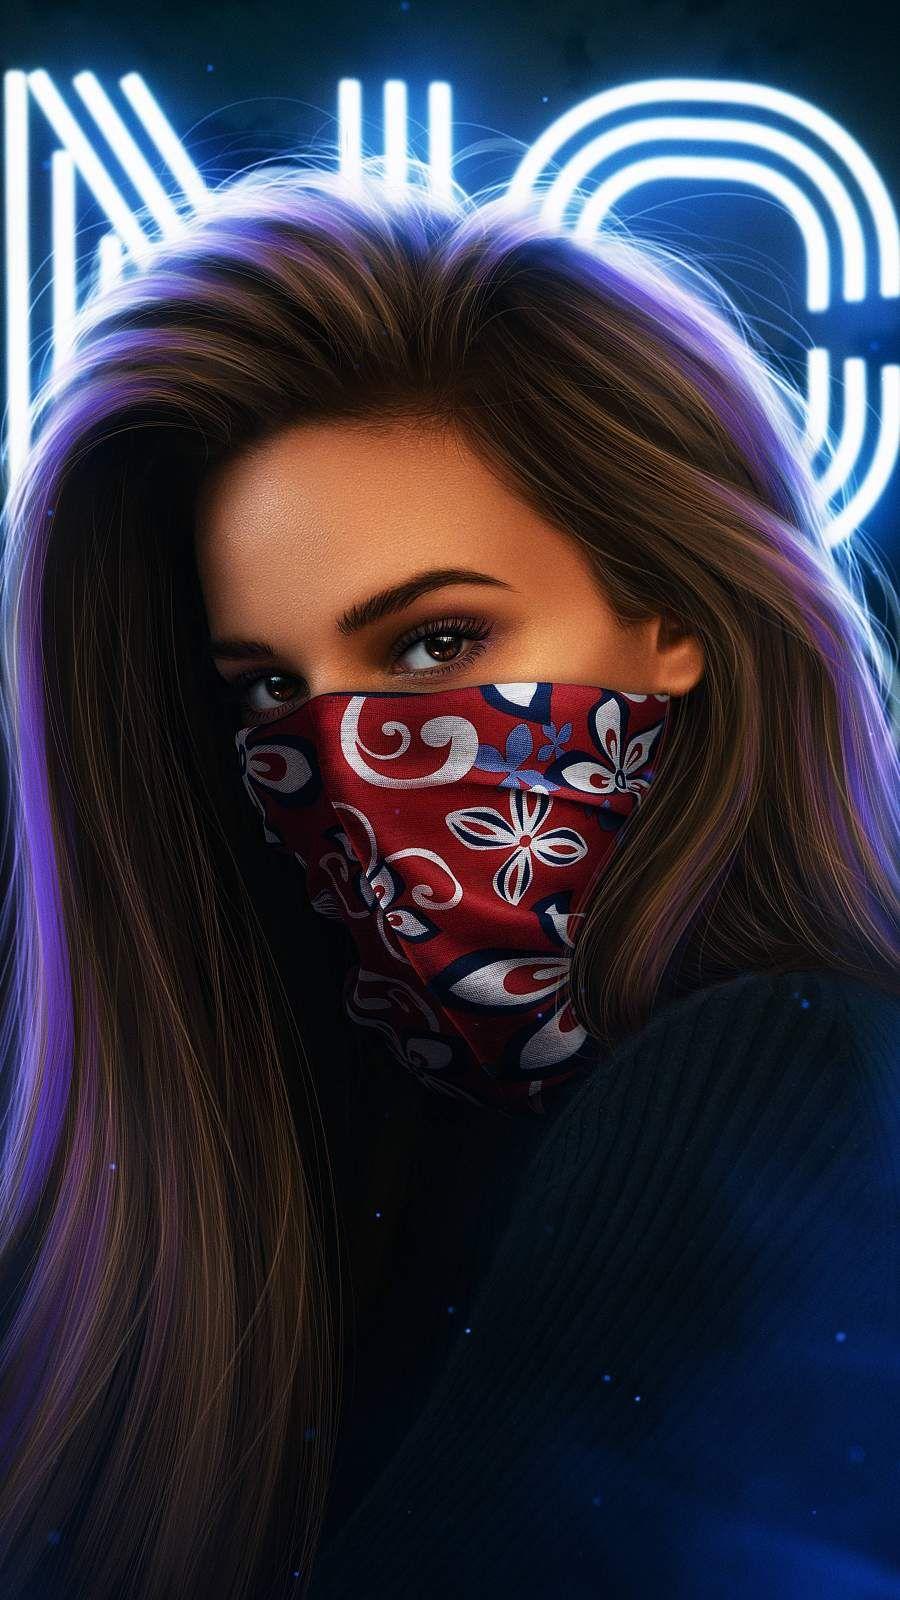 Masked Girl Iphone Wallpaper In 2020 Girl Iphone Wallpaper Beautiful Girl Drawing Mask Girl